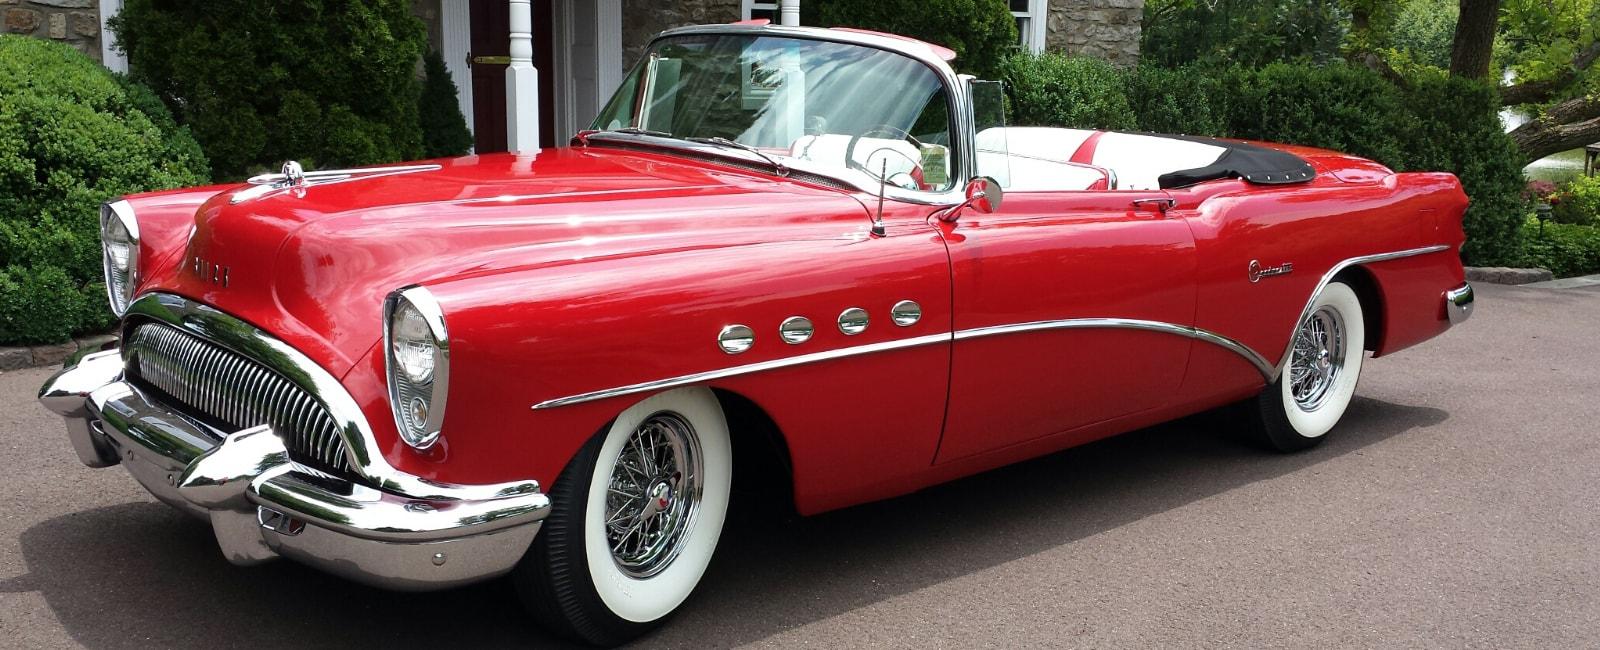 Baldwin Detailing and Collector Car Storage – Emmaus, PA